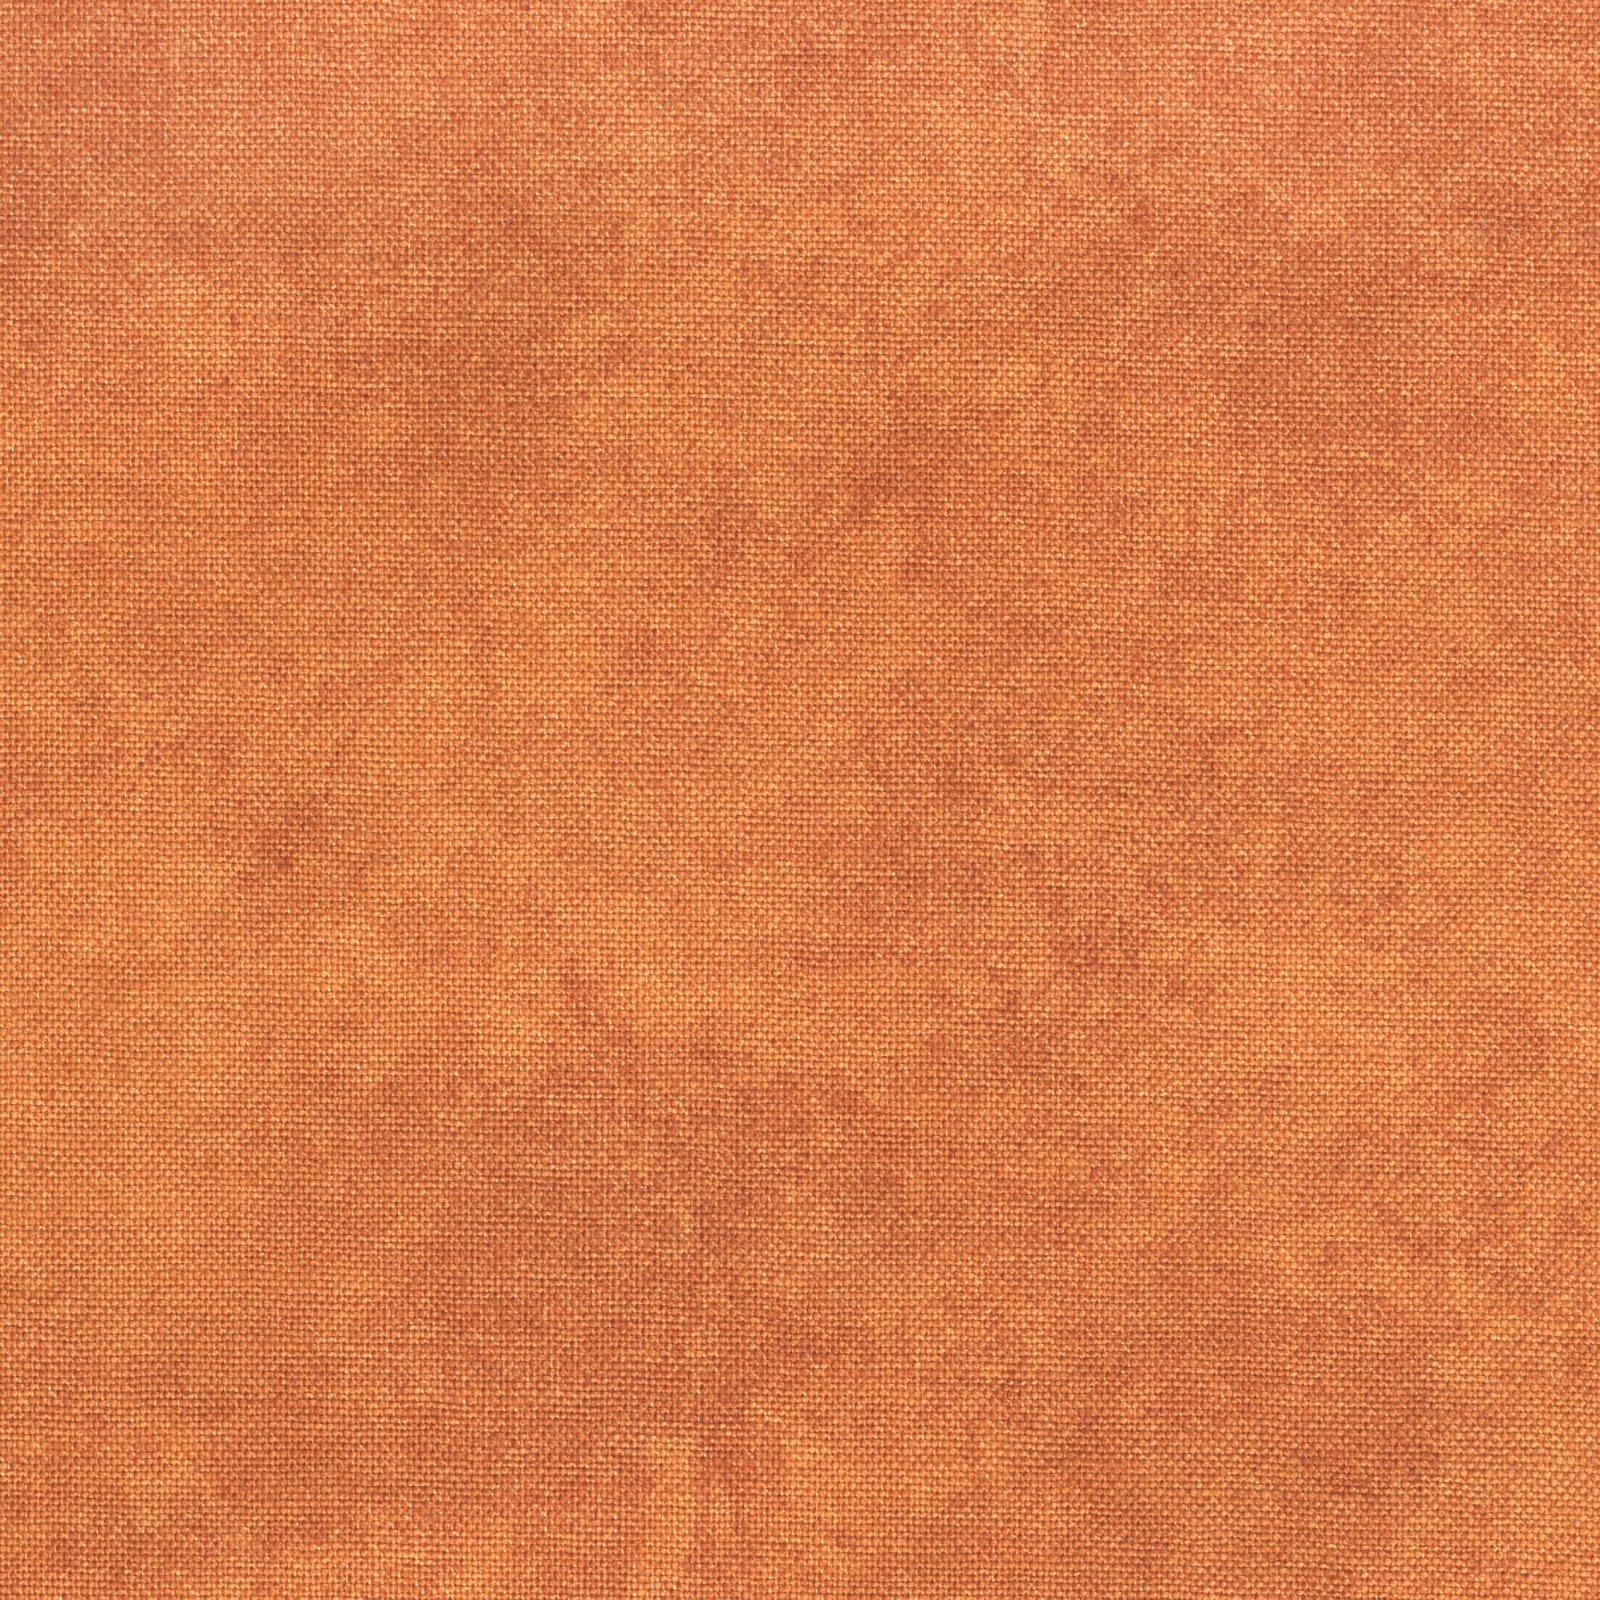 Maywood Shadowplay MAS513-04 Orange